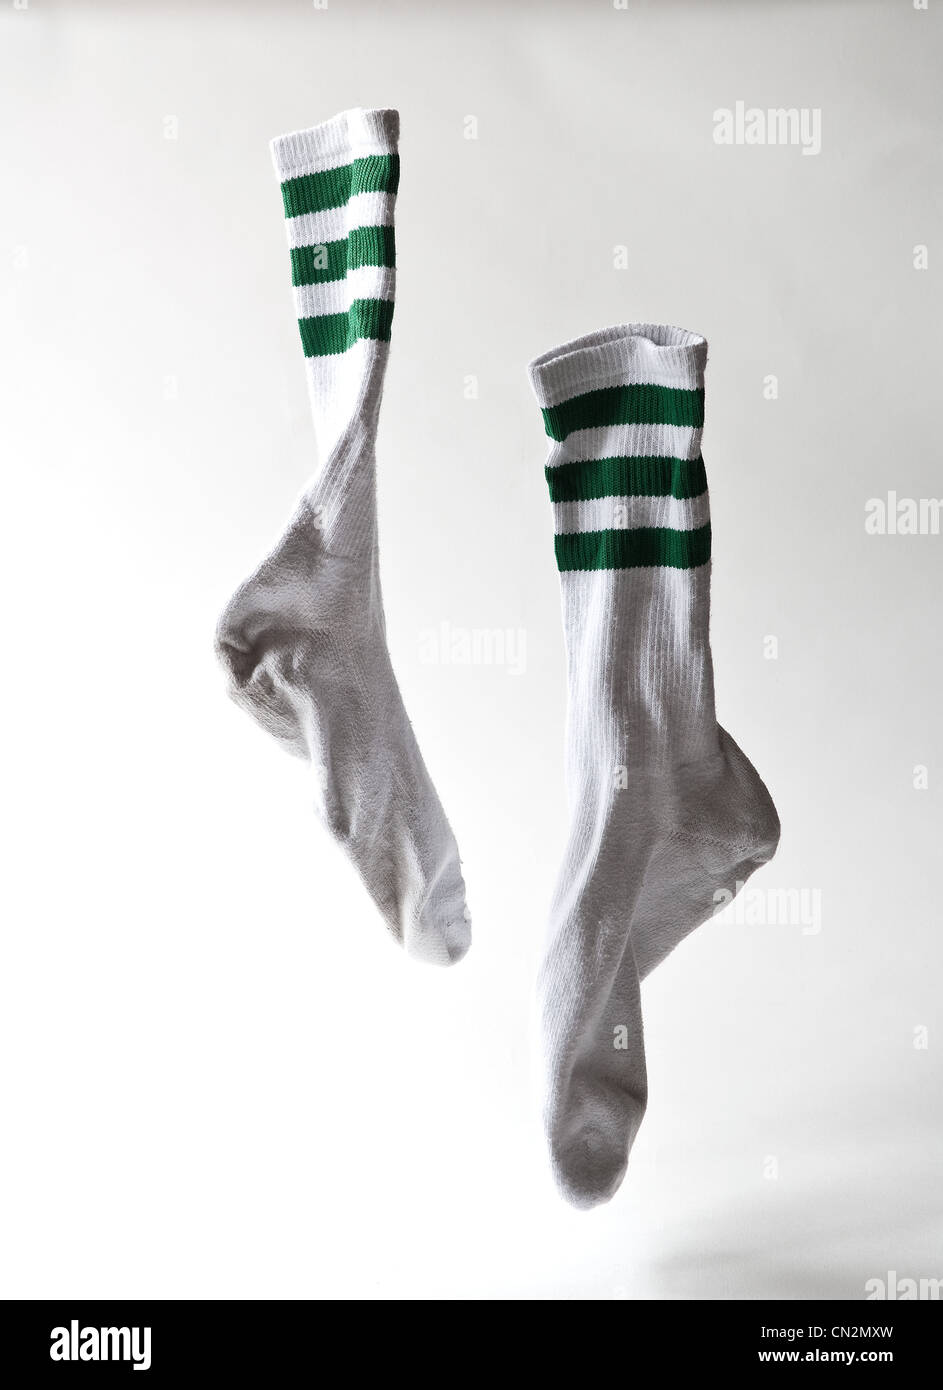 Pair of sports socks, studio shot - Stock Image